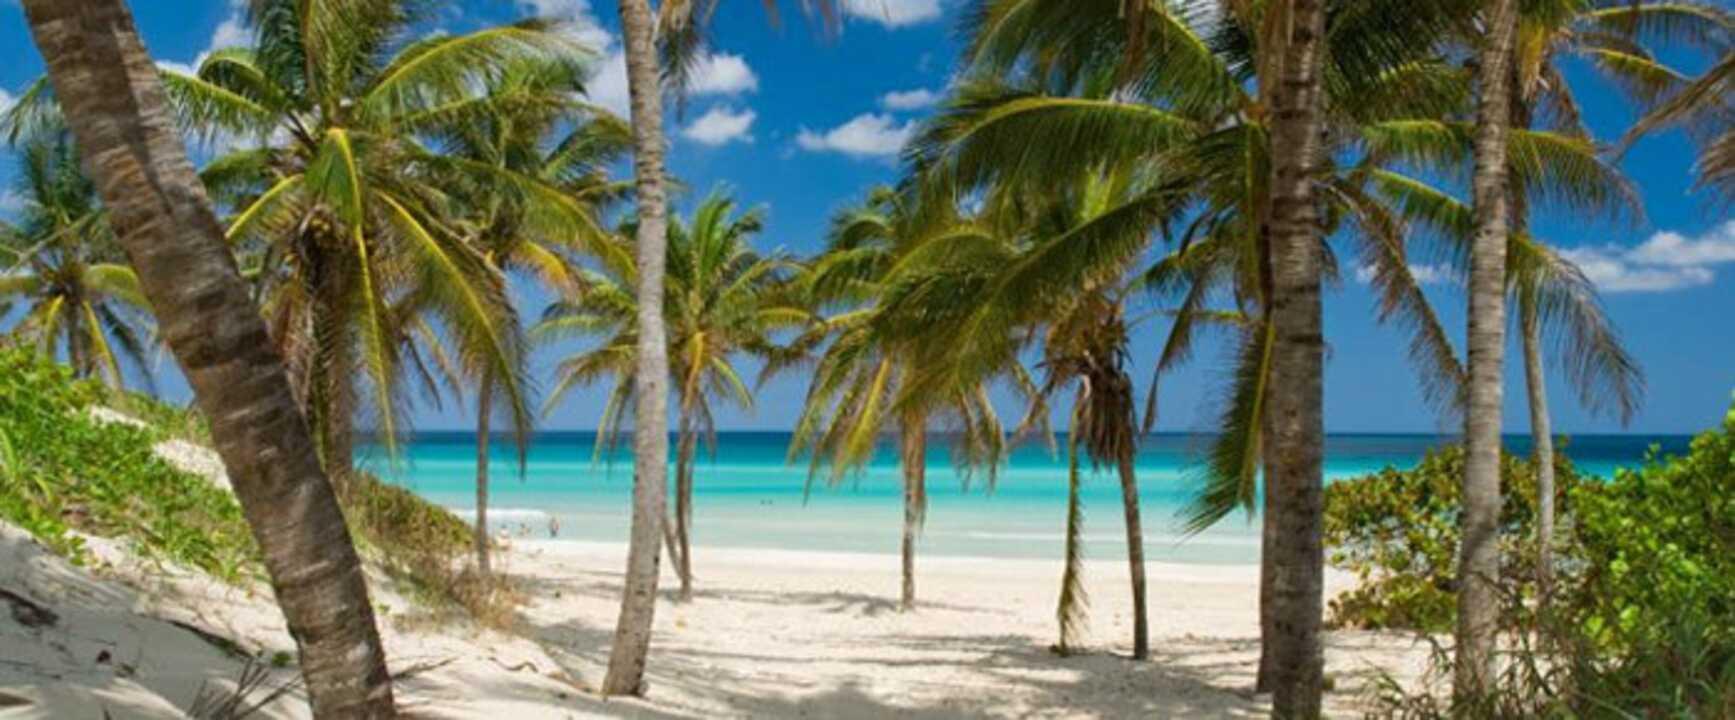 Cuba Holidays